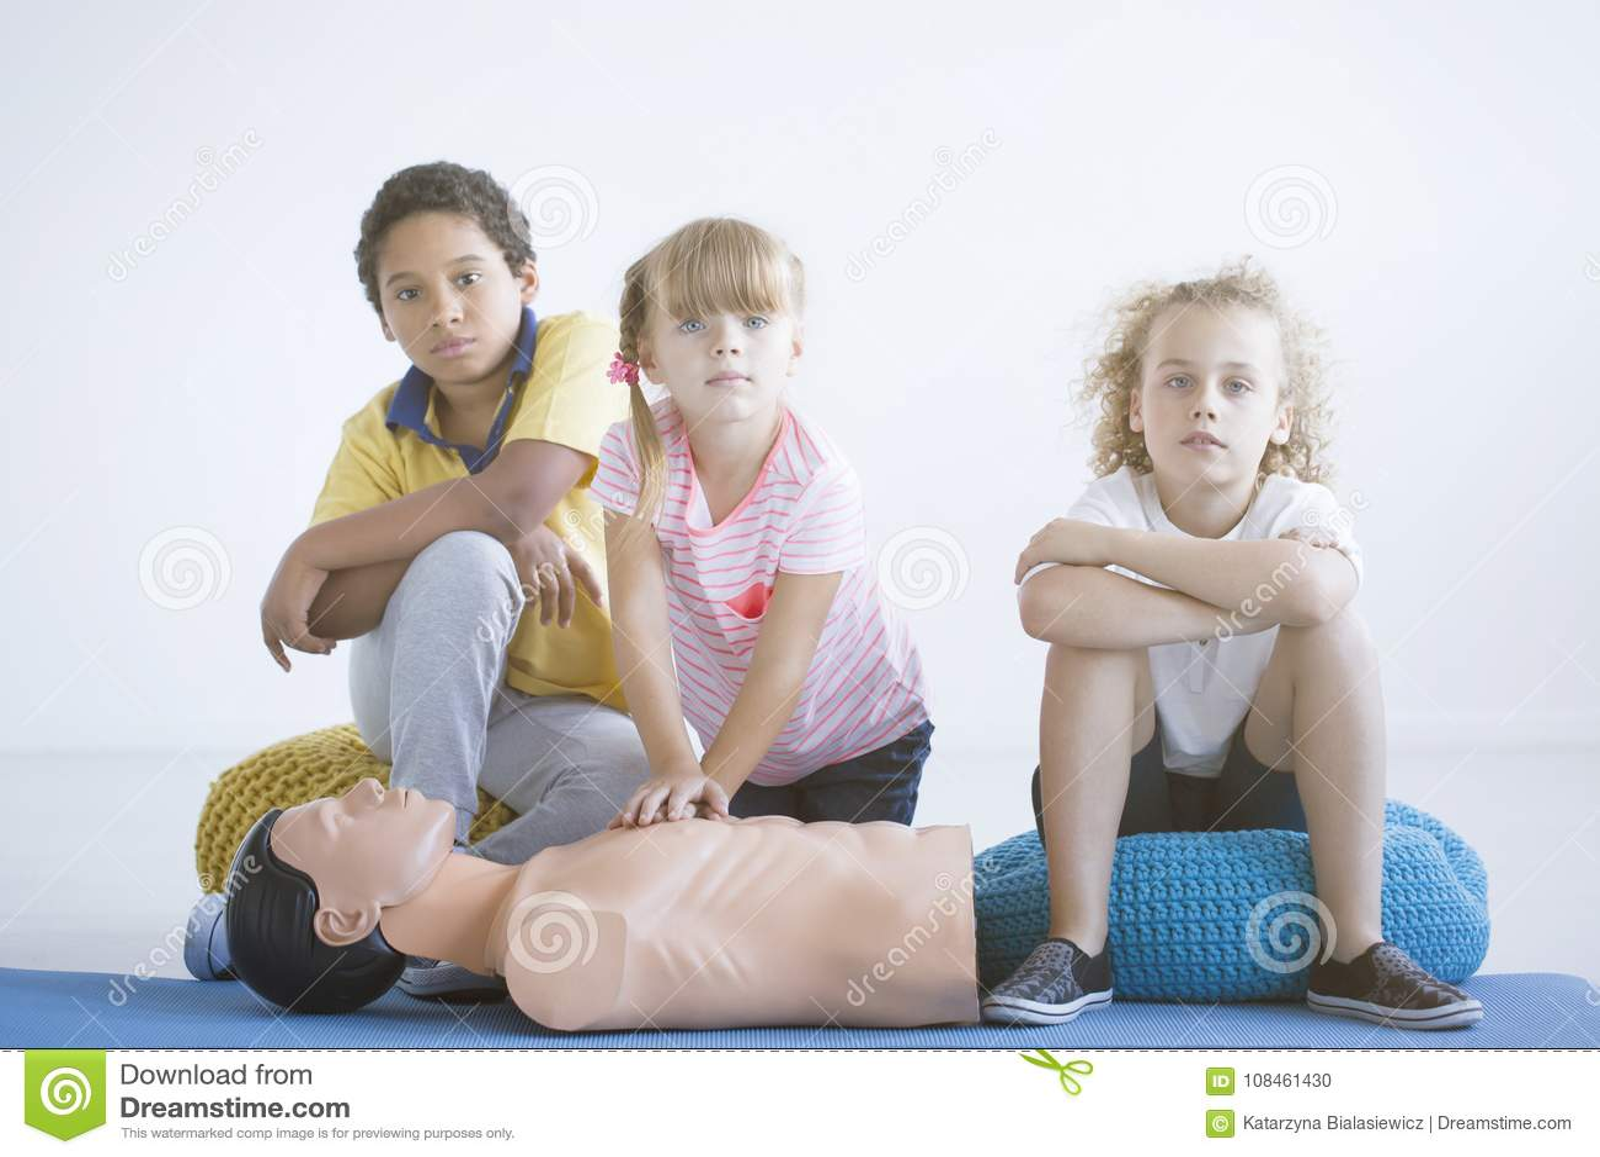 Children practicing chest compressions